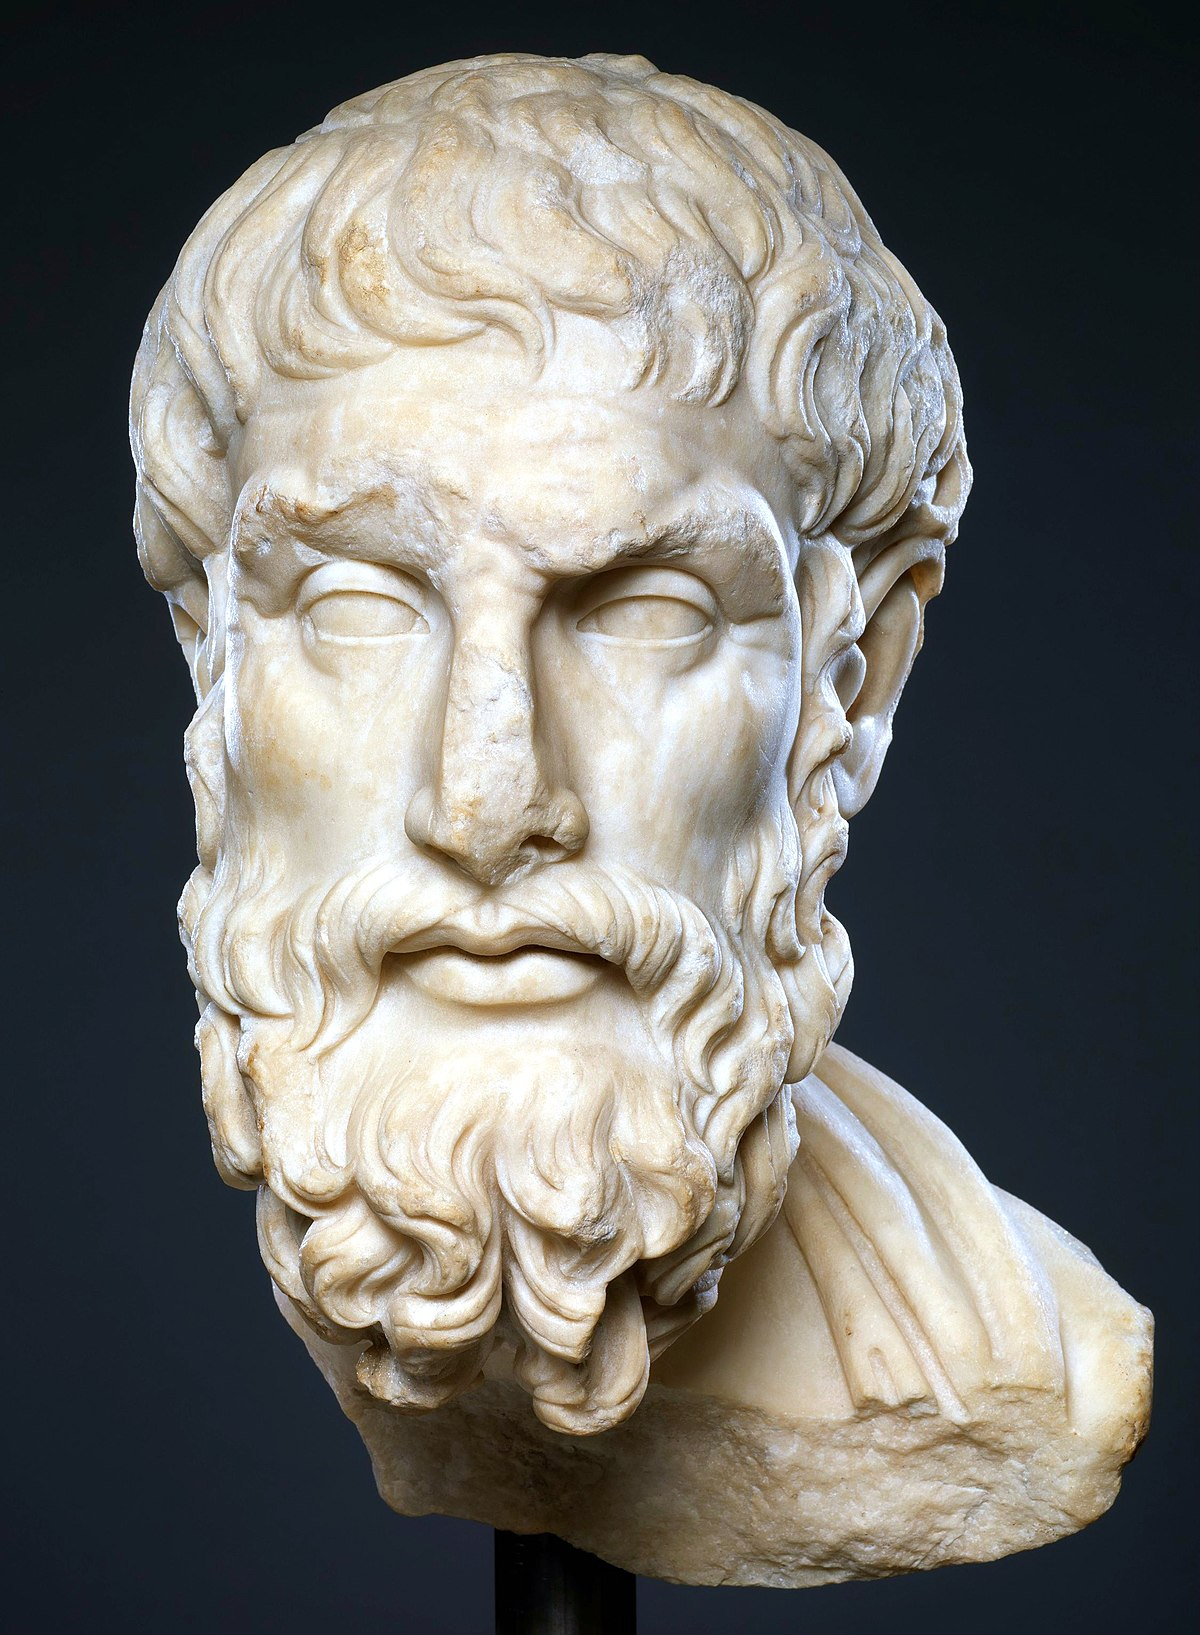 1200px-Marble_head_of_Epikouros_MET_DP333053_(cropped)